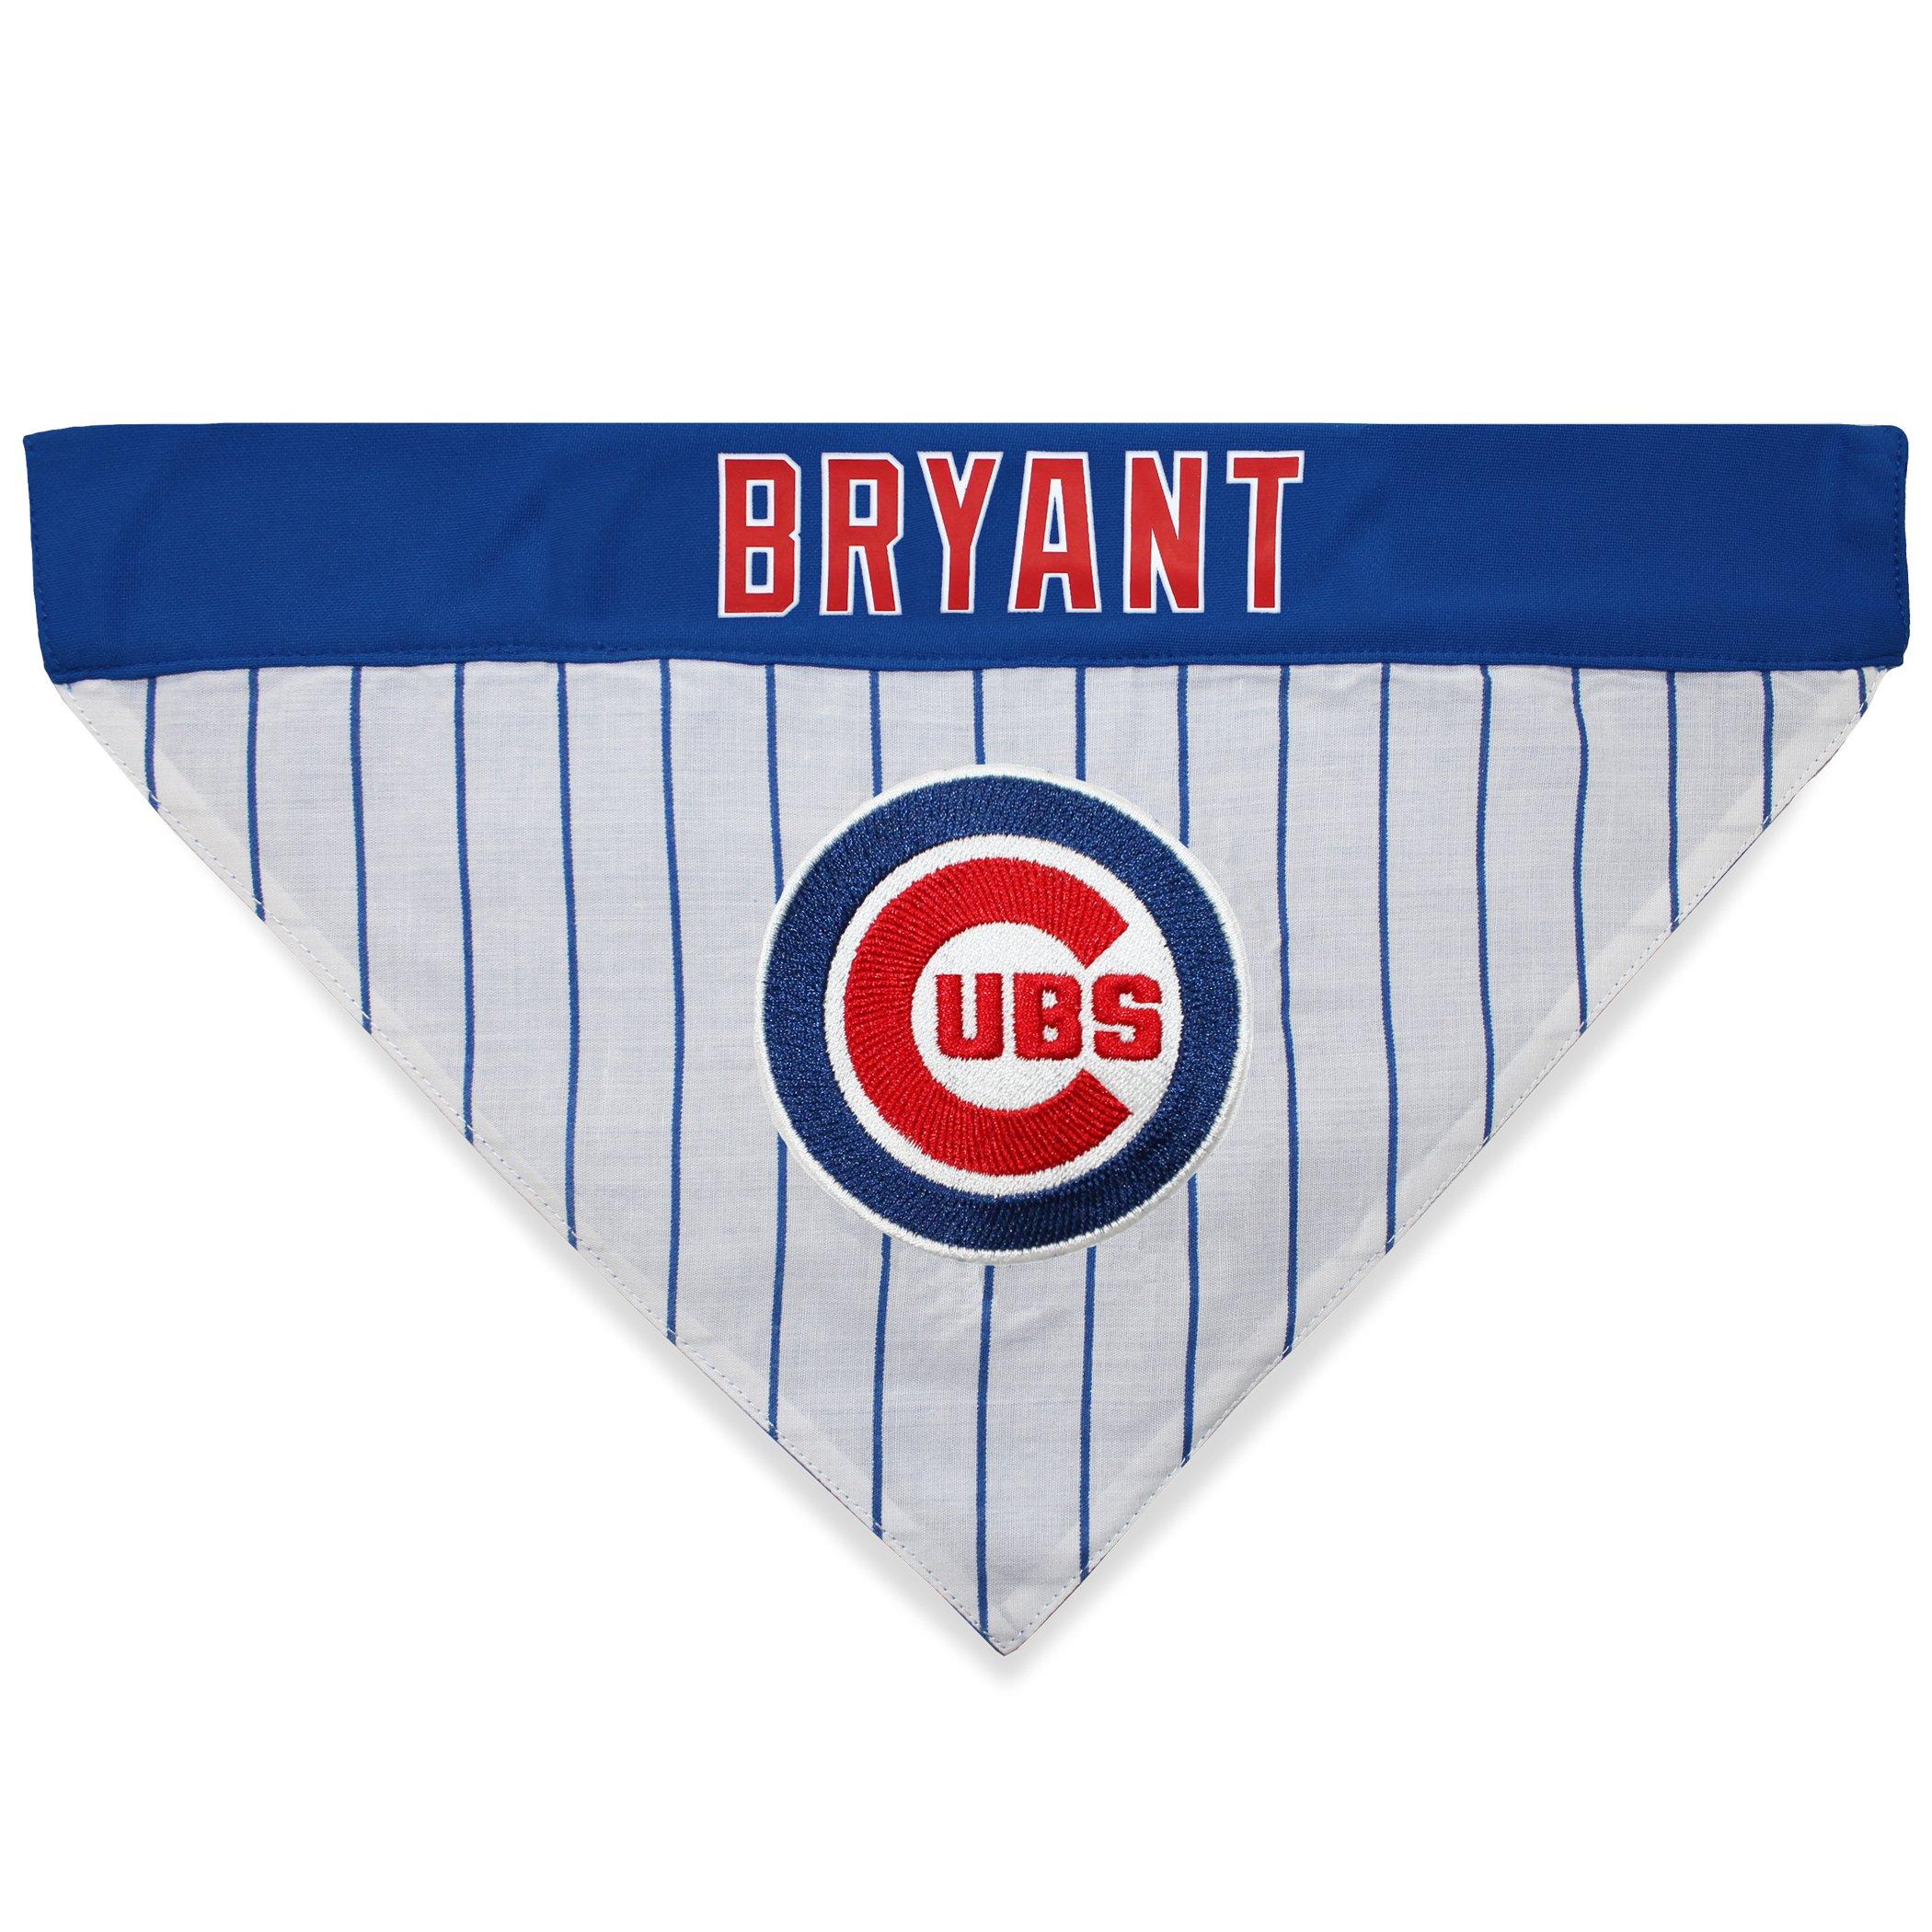 MLBPA Reversible Dog Bandana - Kris Bryant #17 Pet Bandana - MLB Chicago Cubs Home & Away Bandanna, Large/X-Large